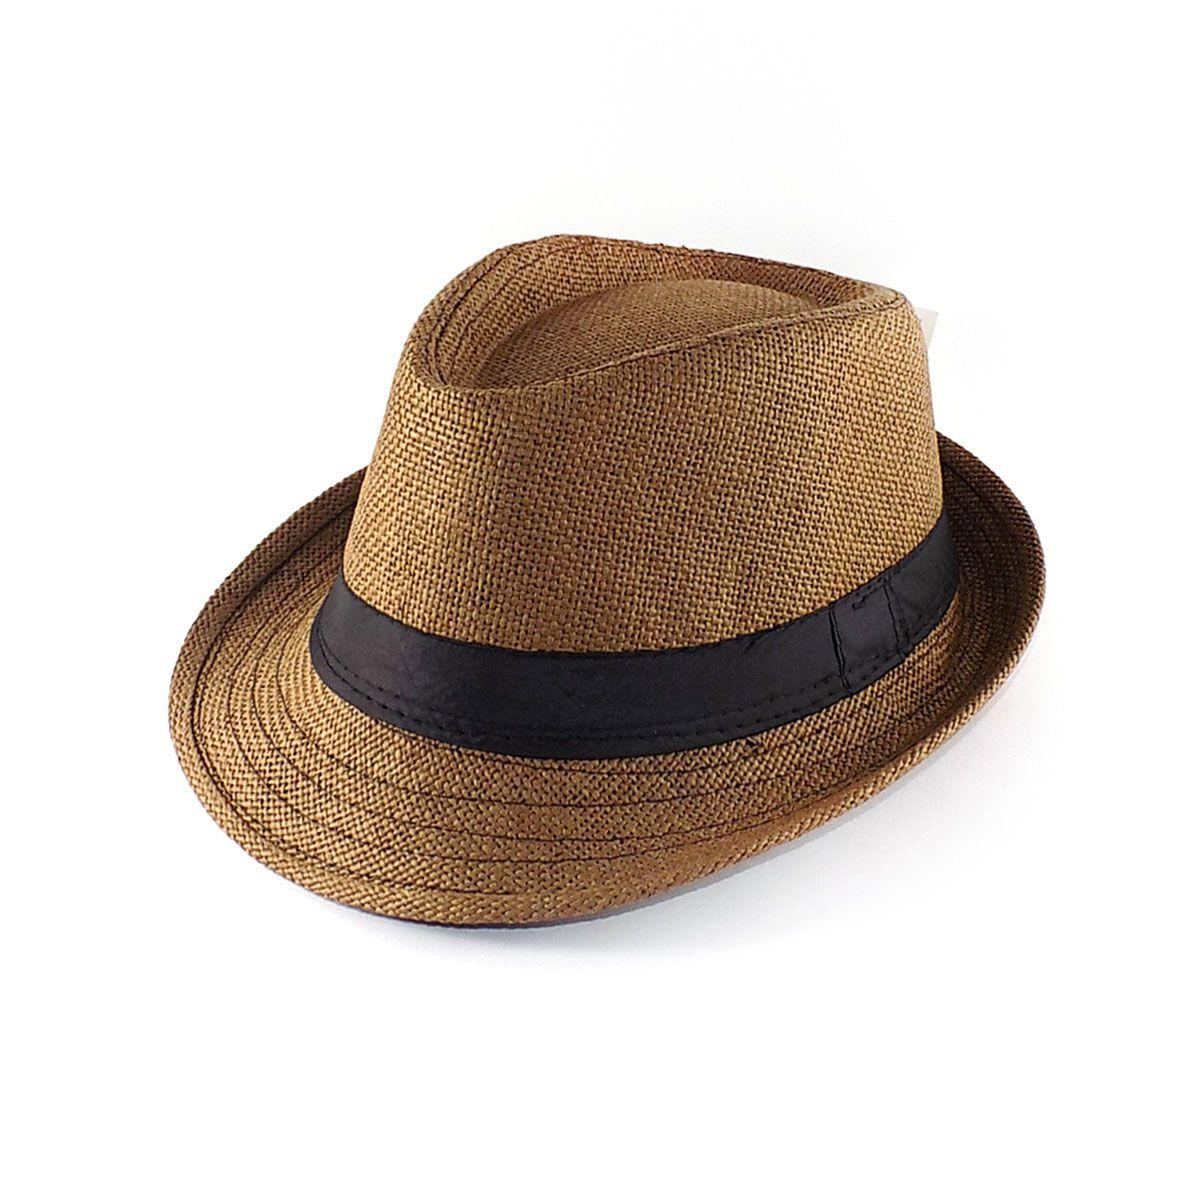 Chapéu Fedora aba curta - Palhinha - Marrom